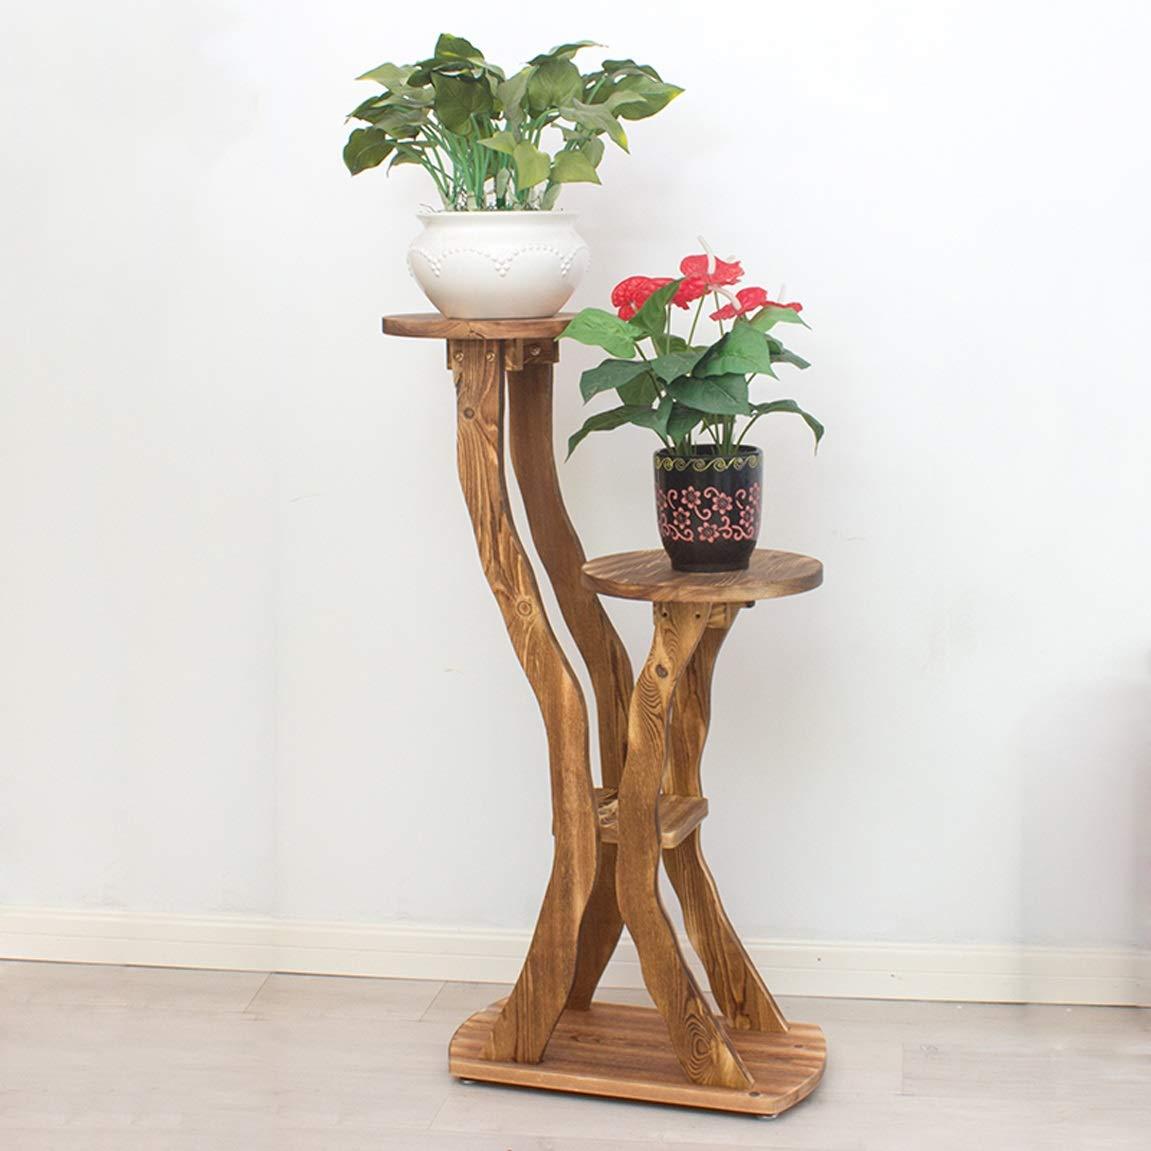 LRW Multi Floor Flower Rack, Solid Wood Floor Balcony, Living Room Indoor Flower Rack, Carbonization